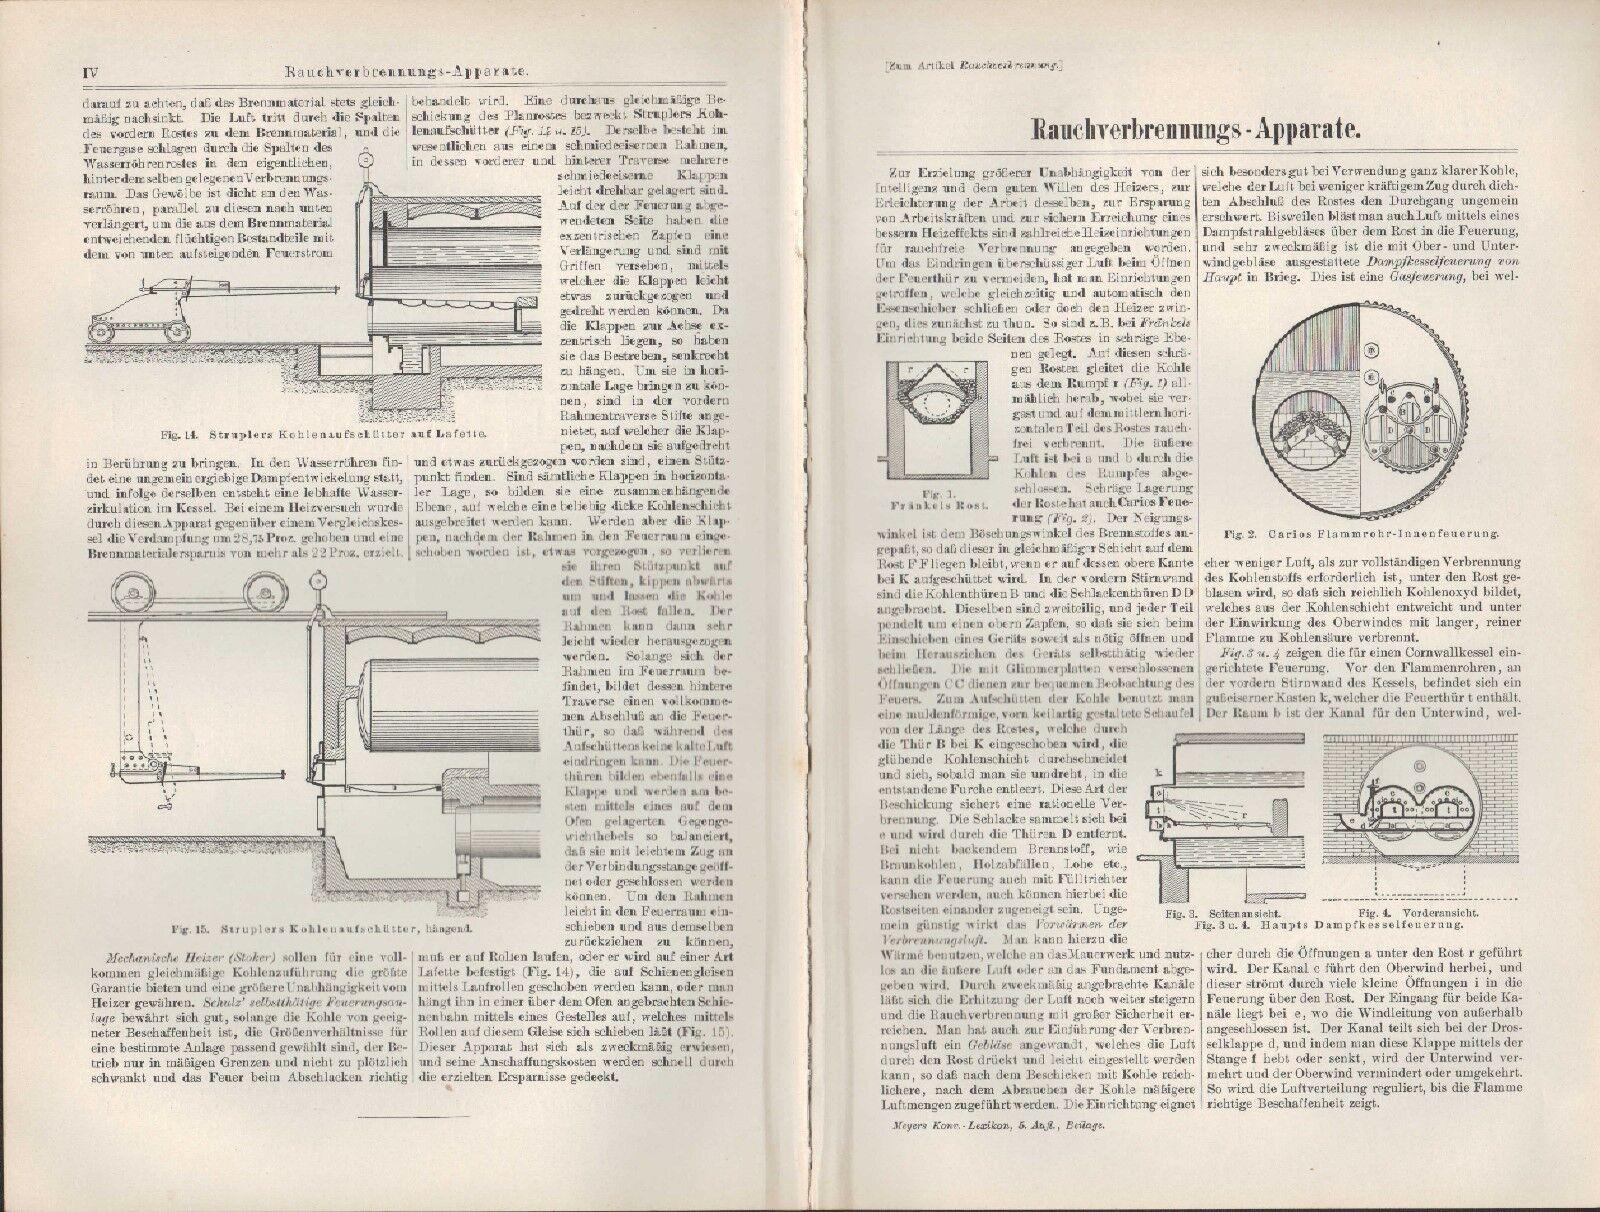 Druck / Lithografie 1896: Rauchgewinnungs-Apparate. Rauch Dampf-Kessel-Feuerung